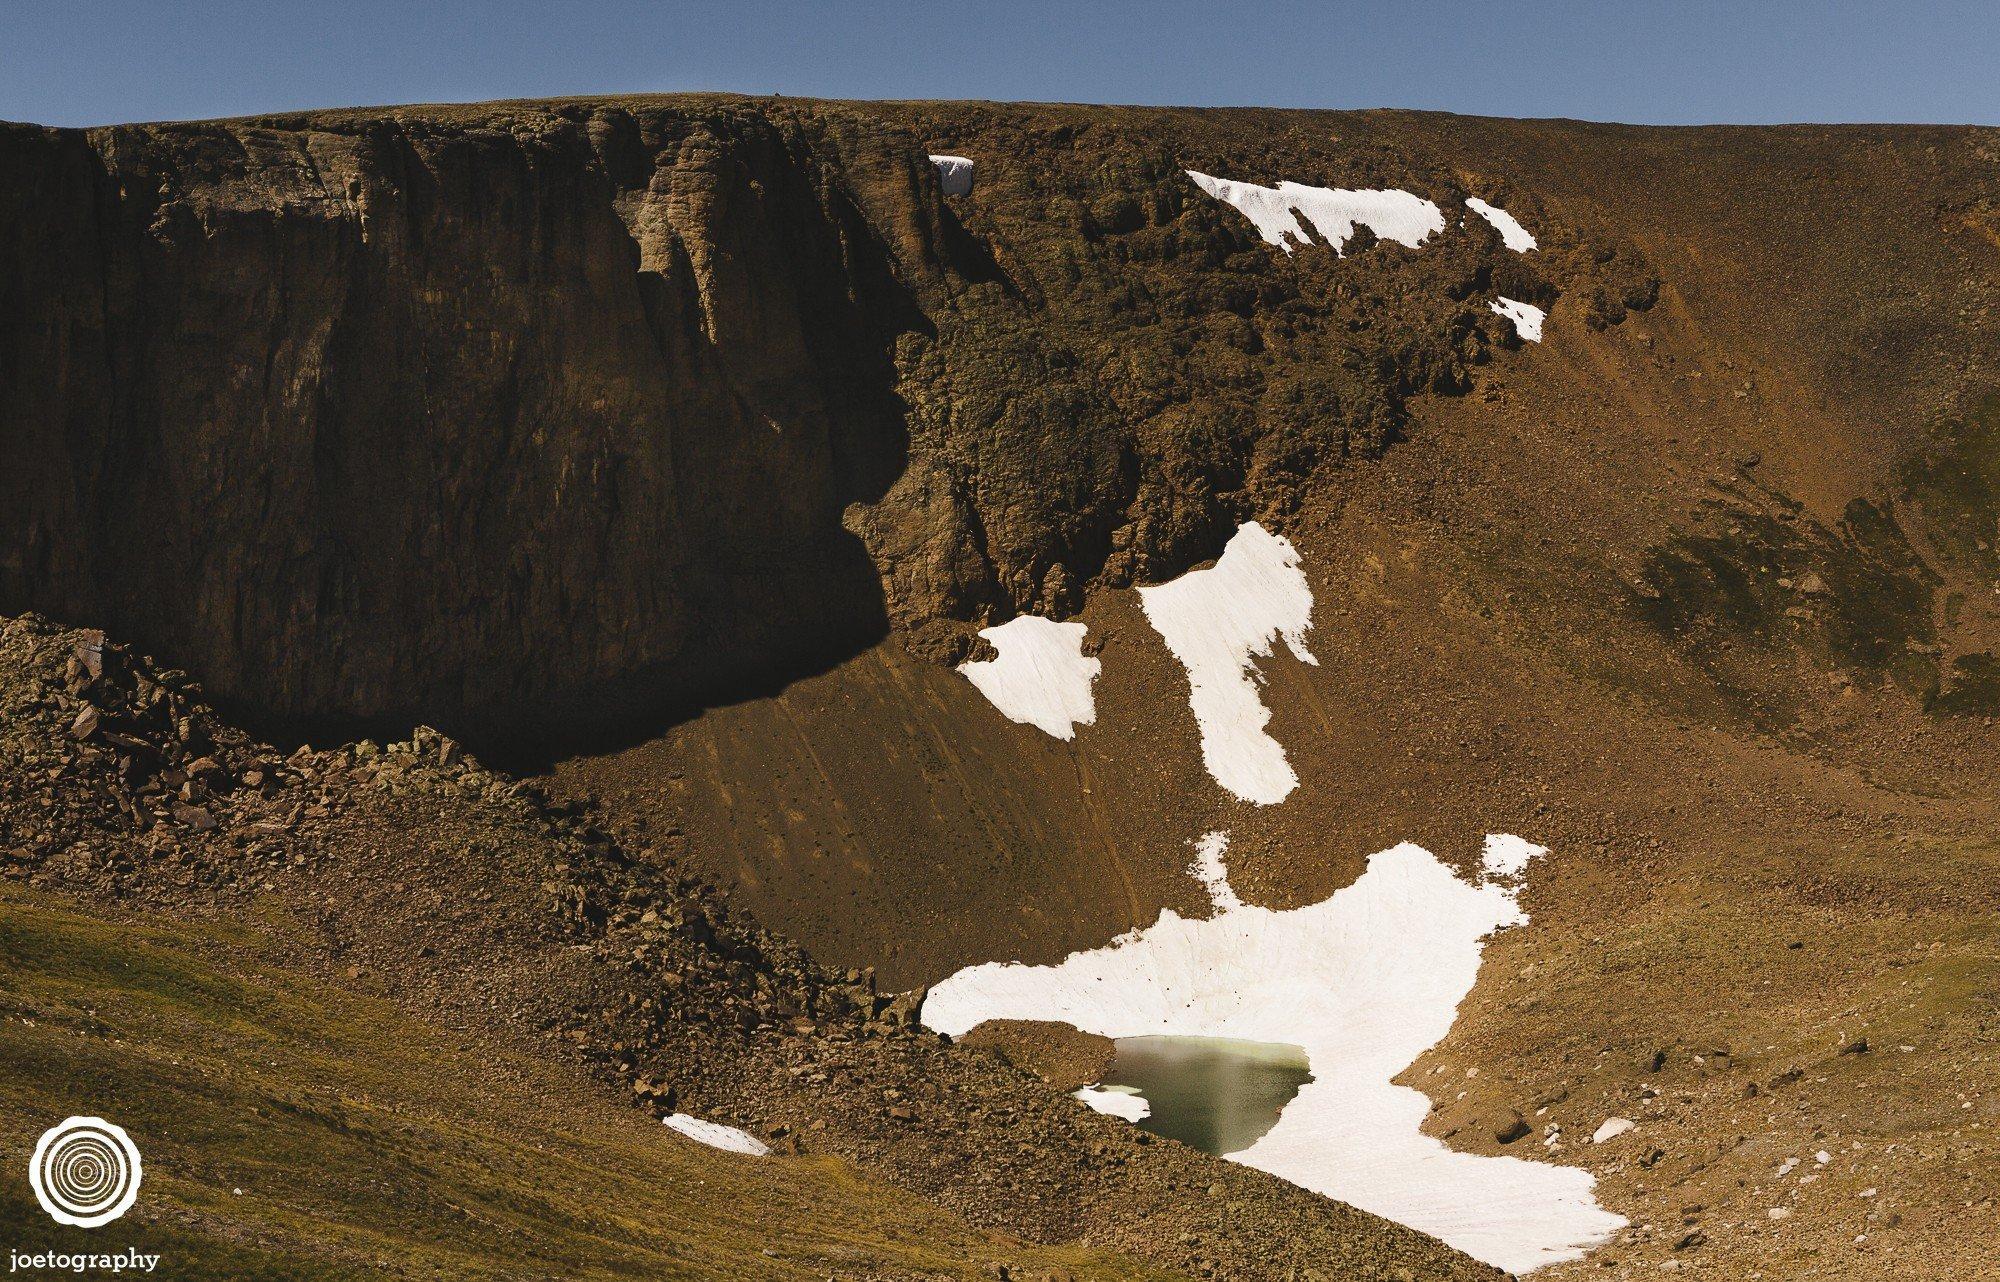 rocky-mountain-national-park-landscape-photographer-indianapolis-3